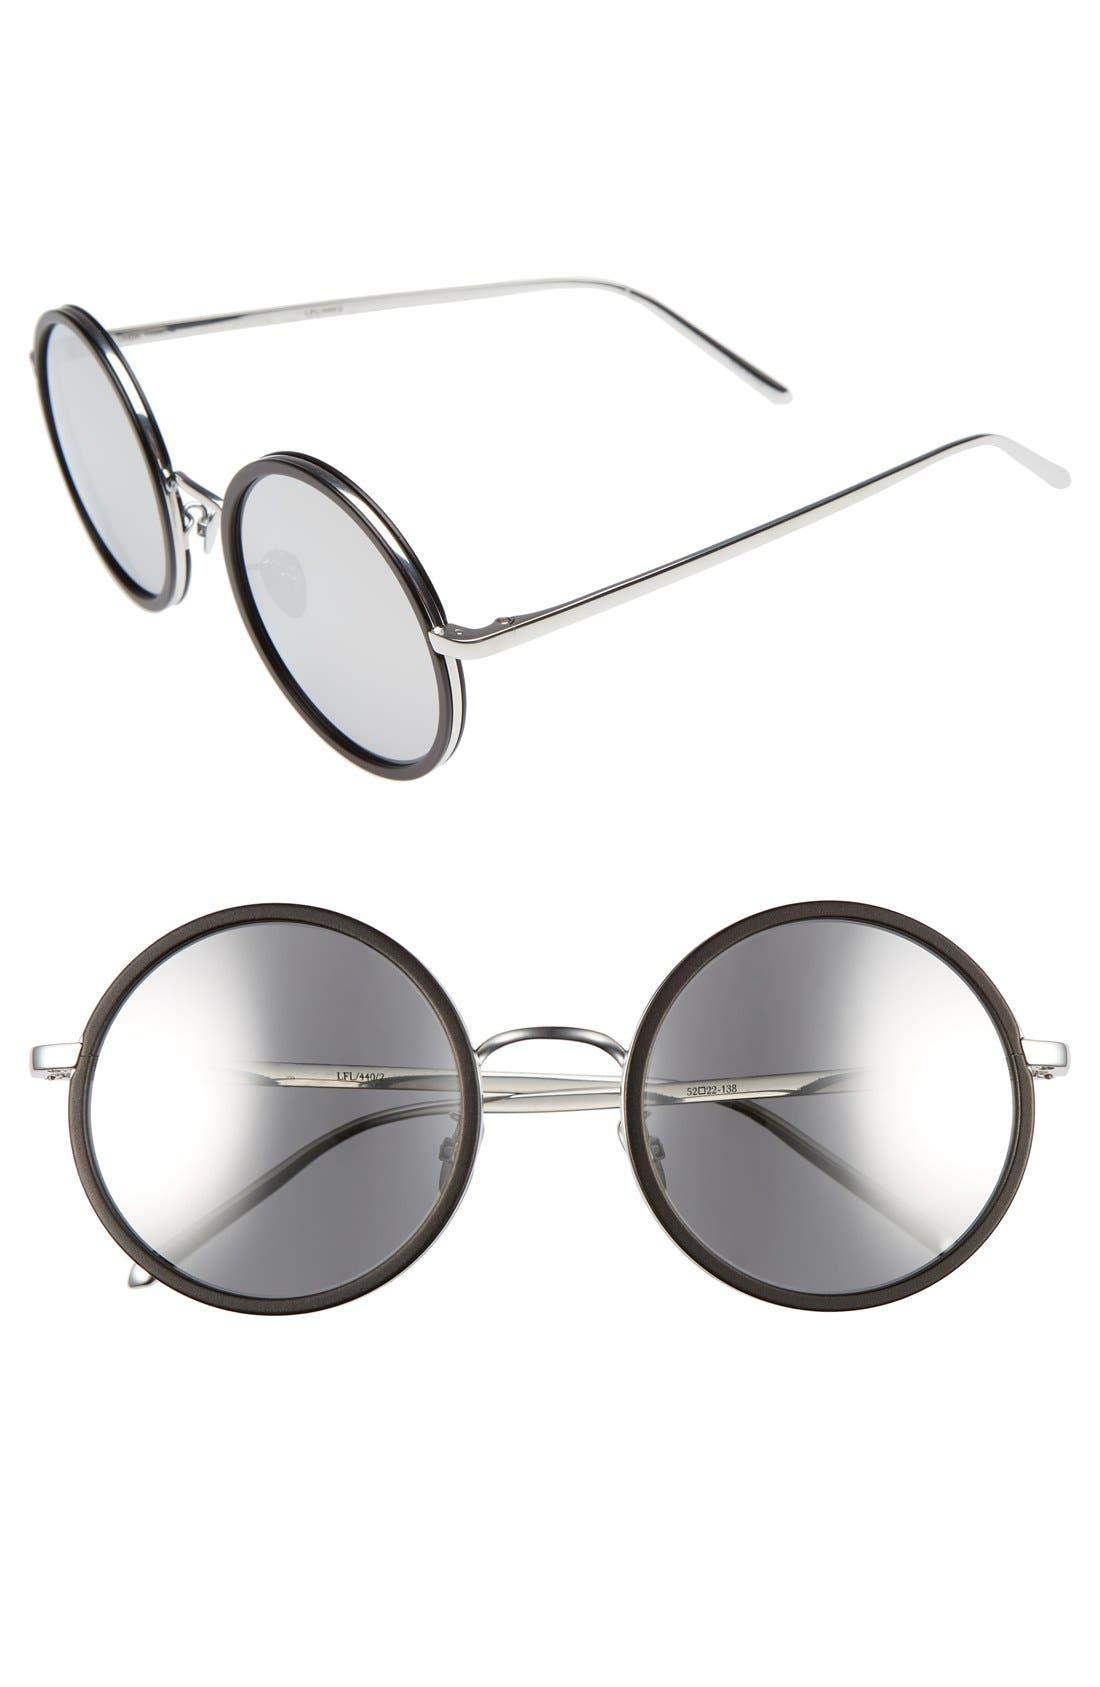 Alternate Image 1 Selected - Linda Farrow 52mm Round 18 Karat White Gold Trim Sunglasses